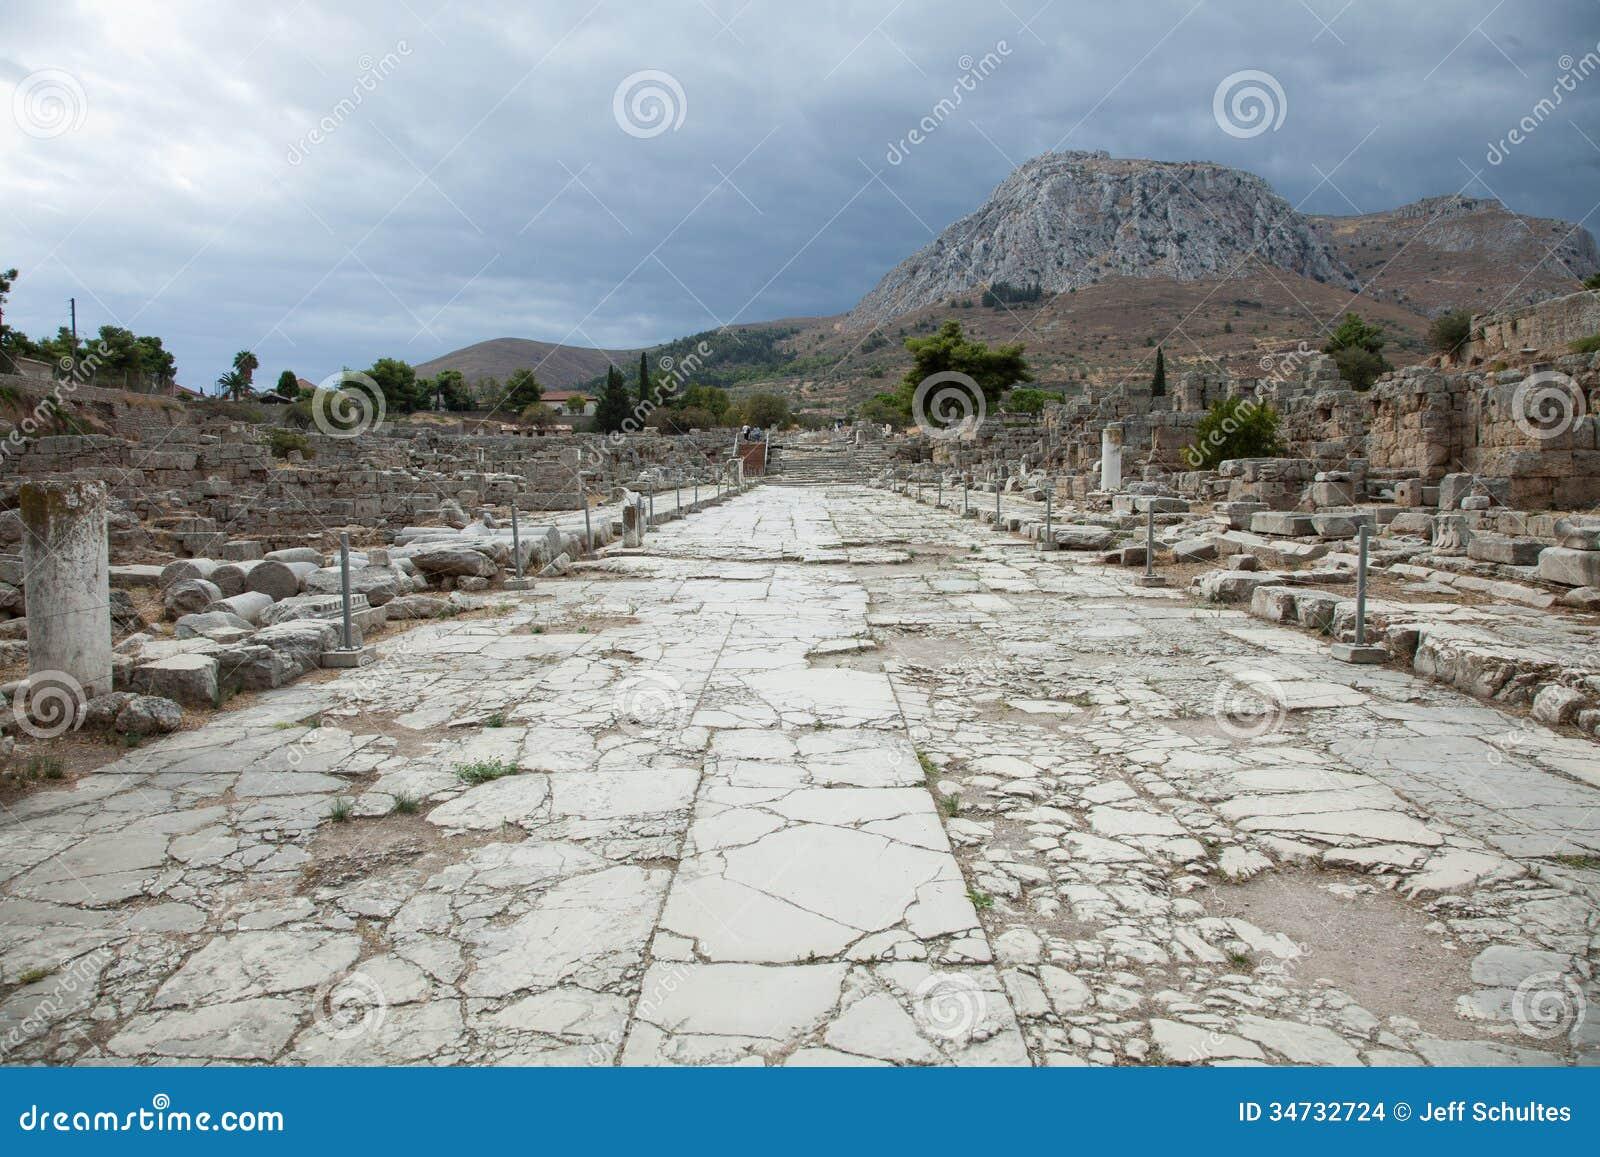 Lechaion Road Stock Images - Image: 34732724